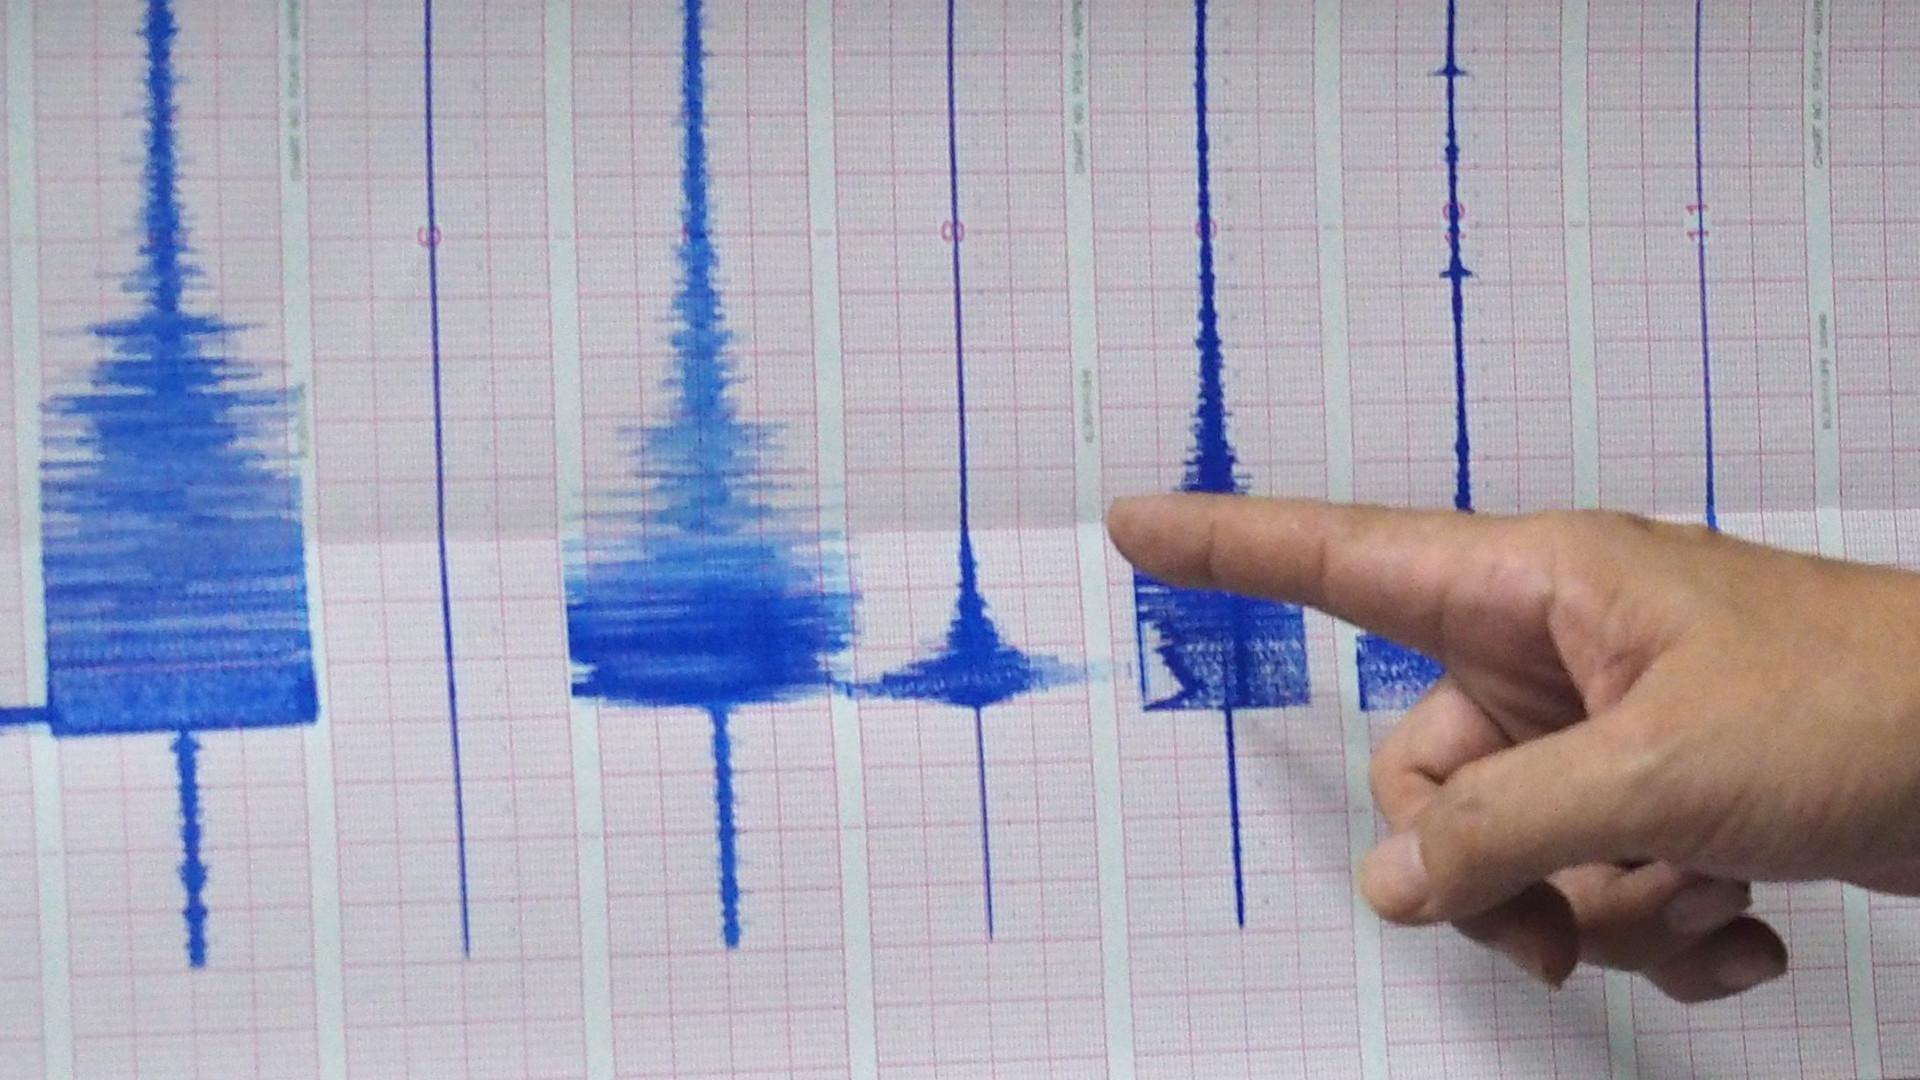 Novo sismo sentido perto de Torre de Moncorvo